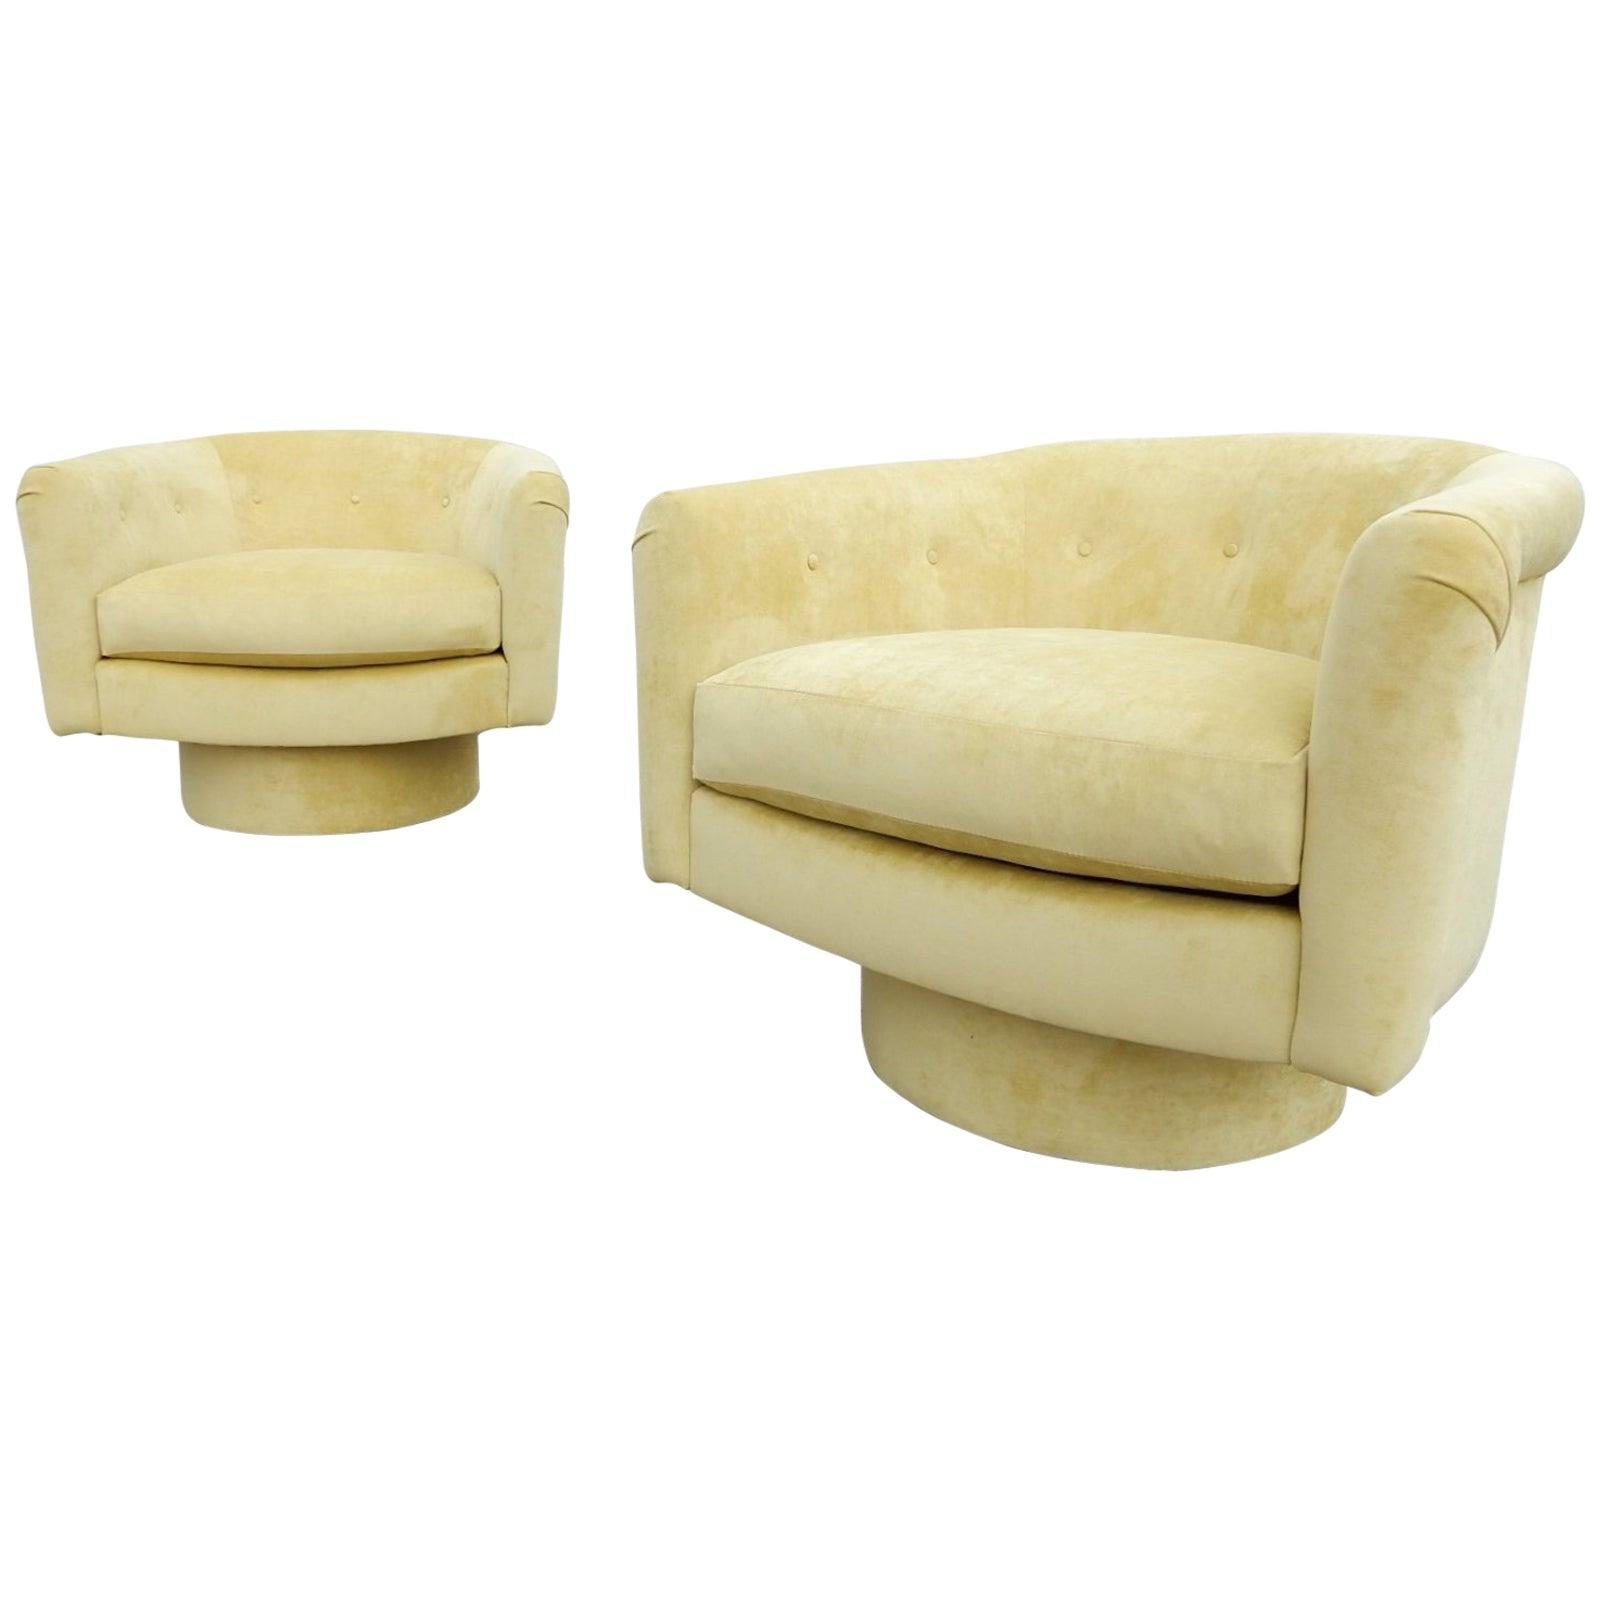 Pair of 1970s Milo Baughman Style Velvet Swivel Lounge Chairs